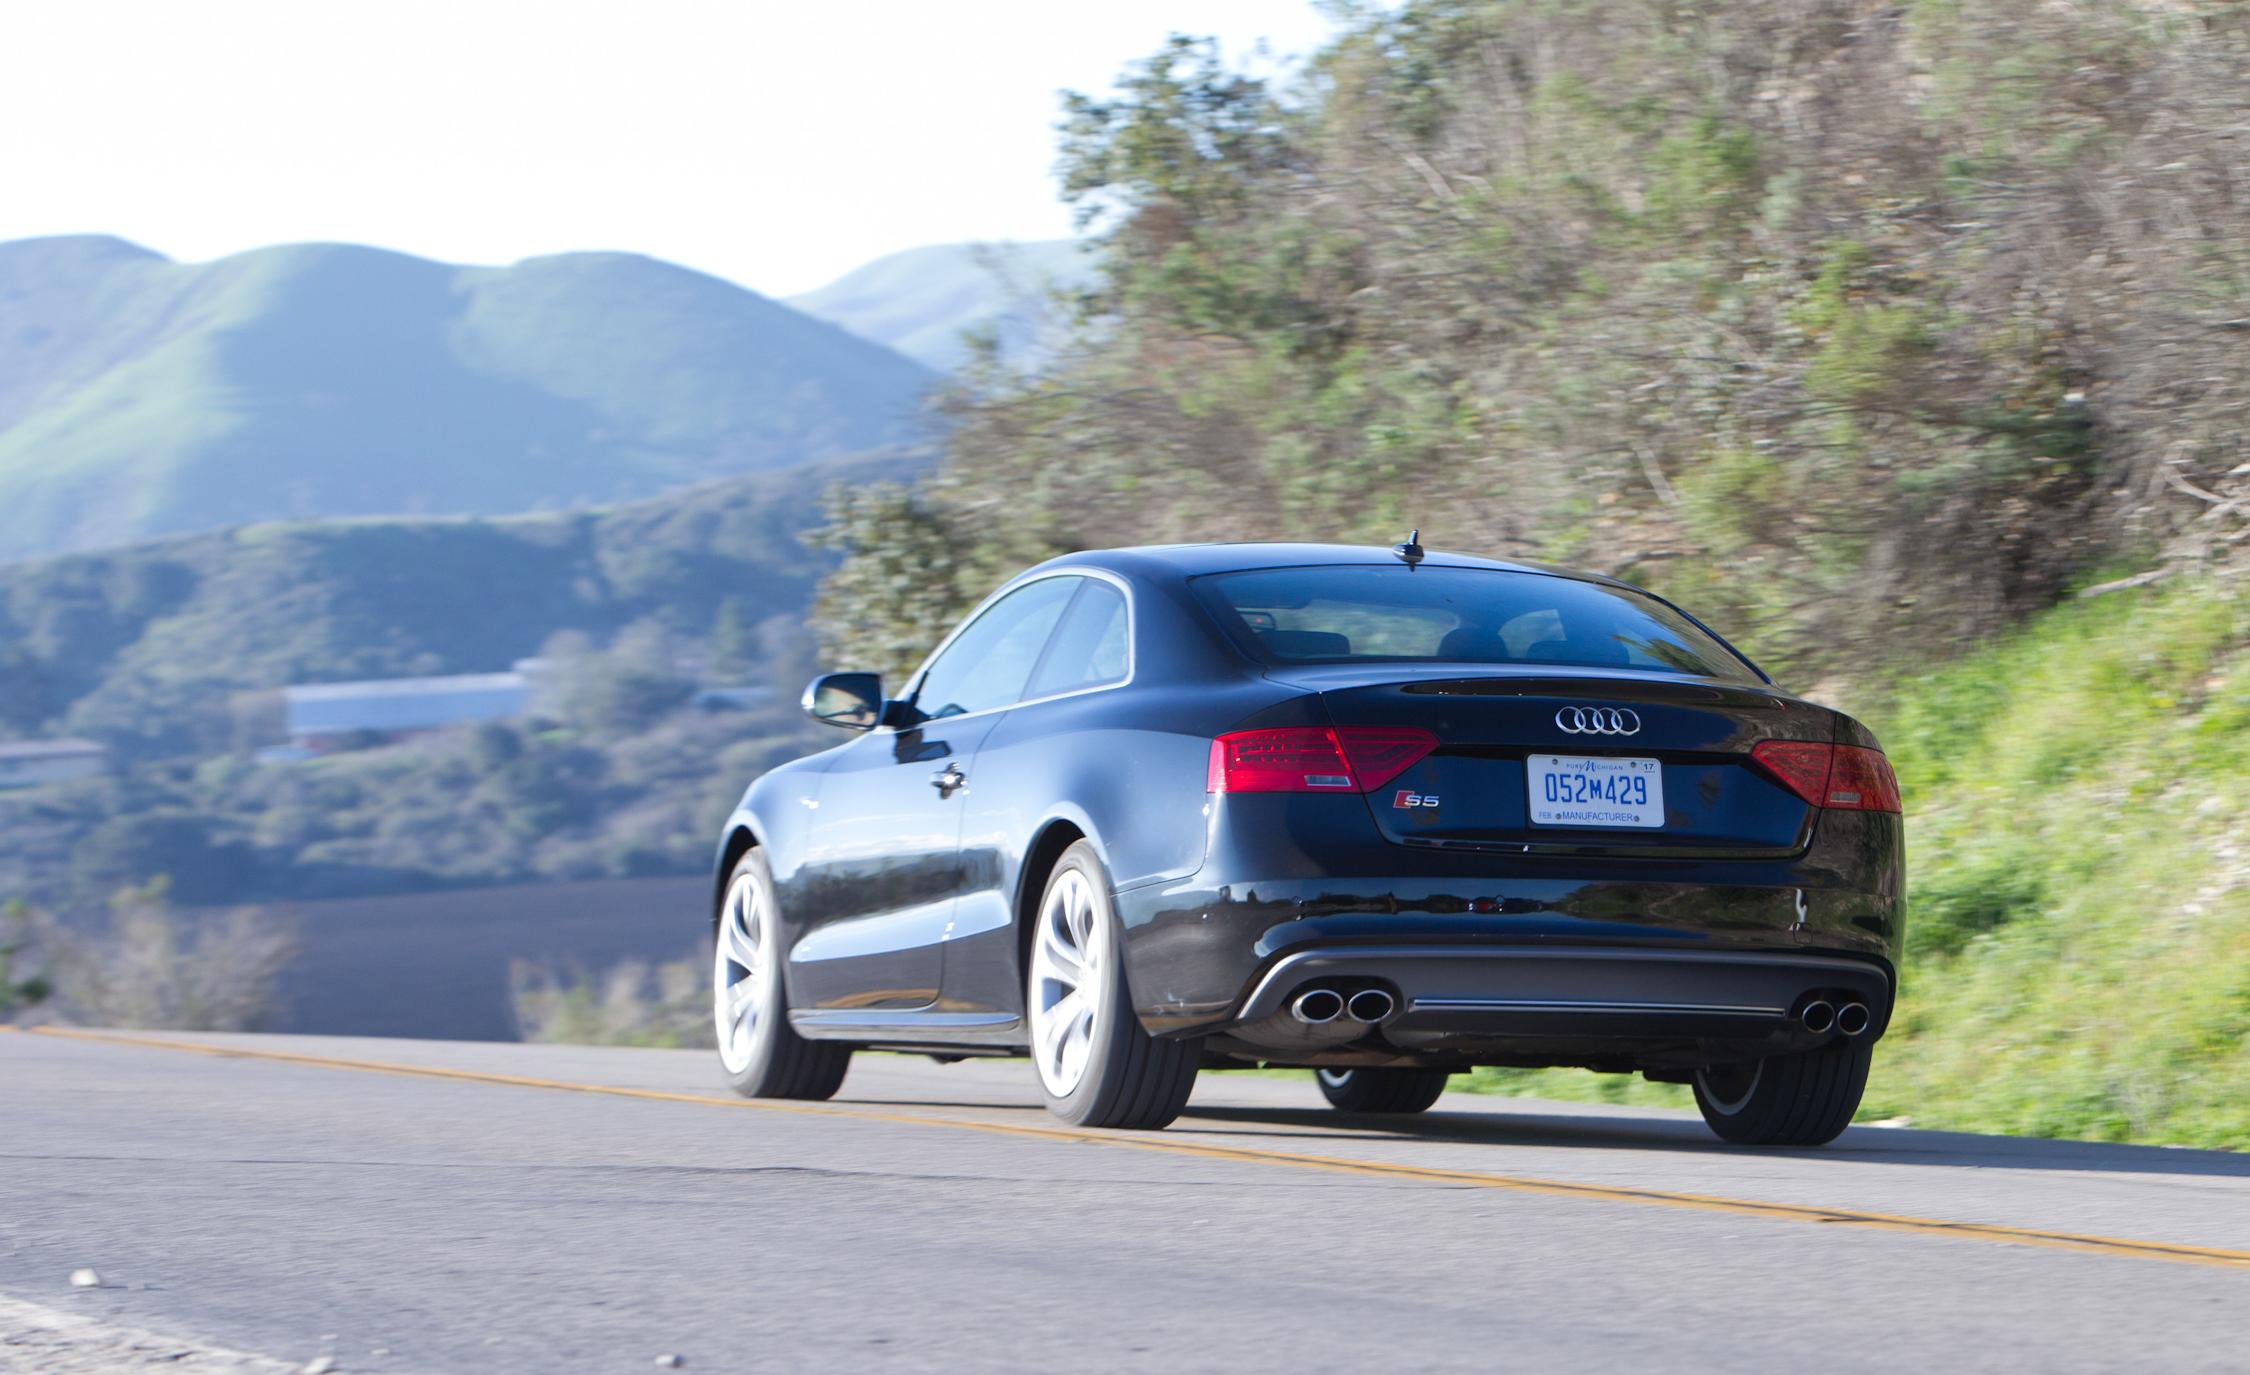 2015 Audi S5 Rear Side Design